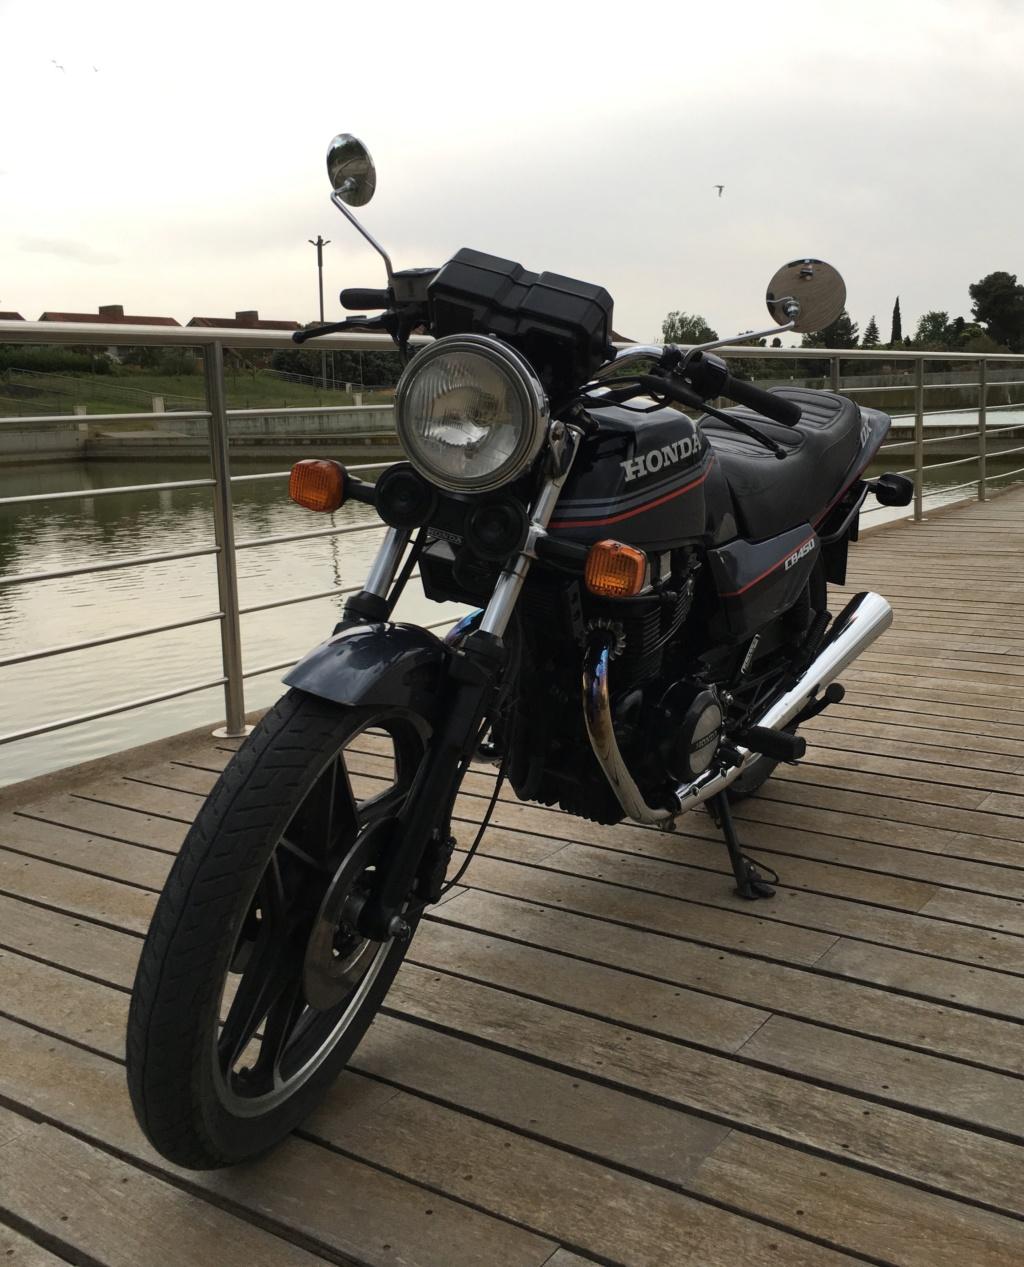 OS presentó mi nueva moto: Honda CB 450 DX Img_0513